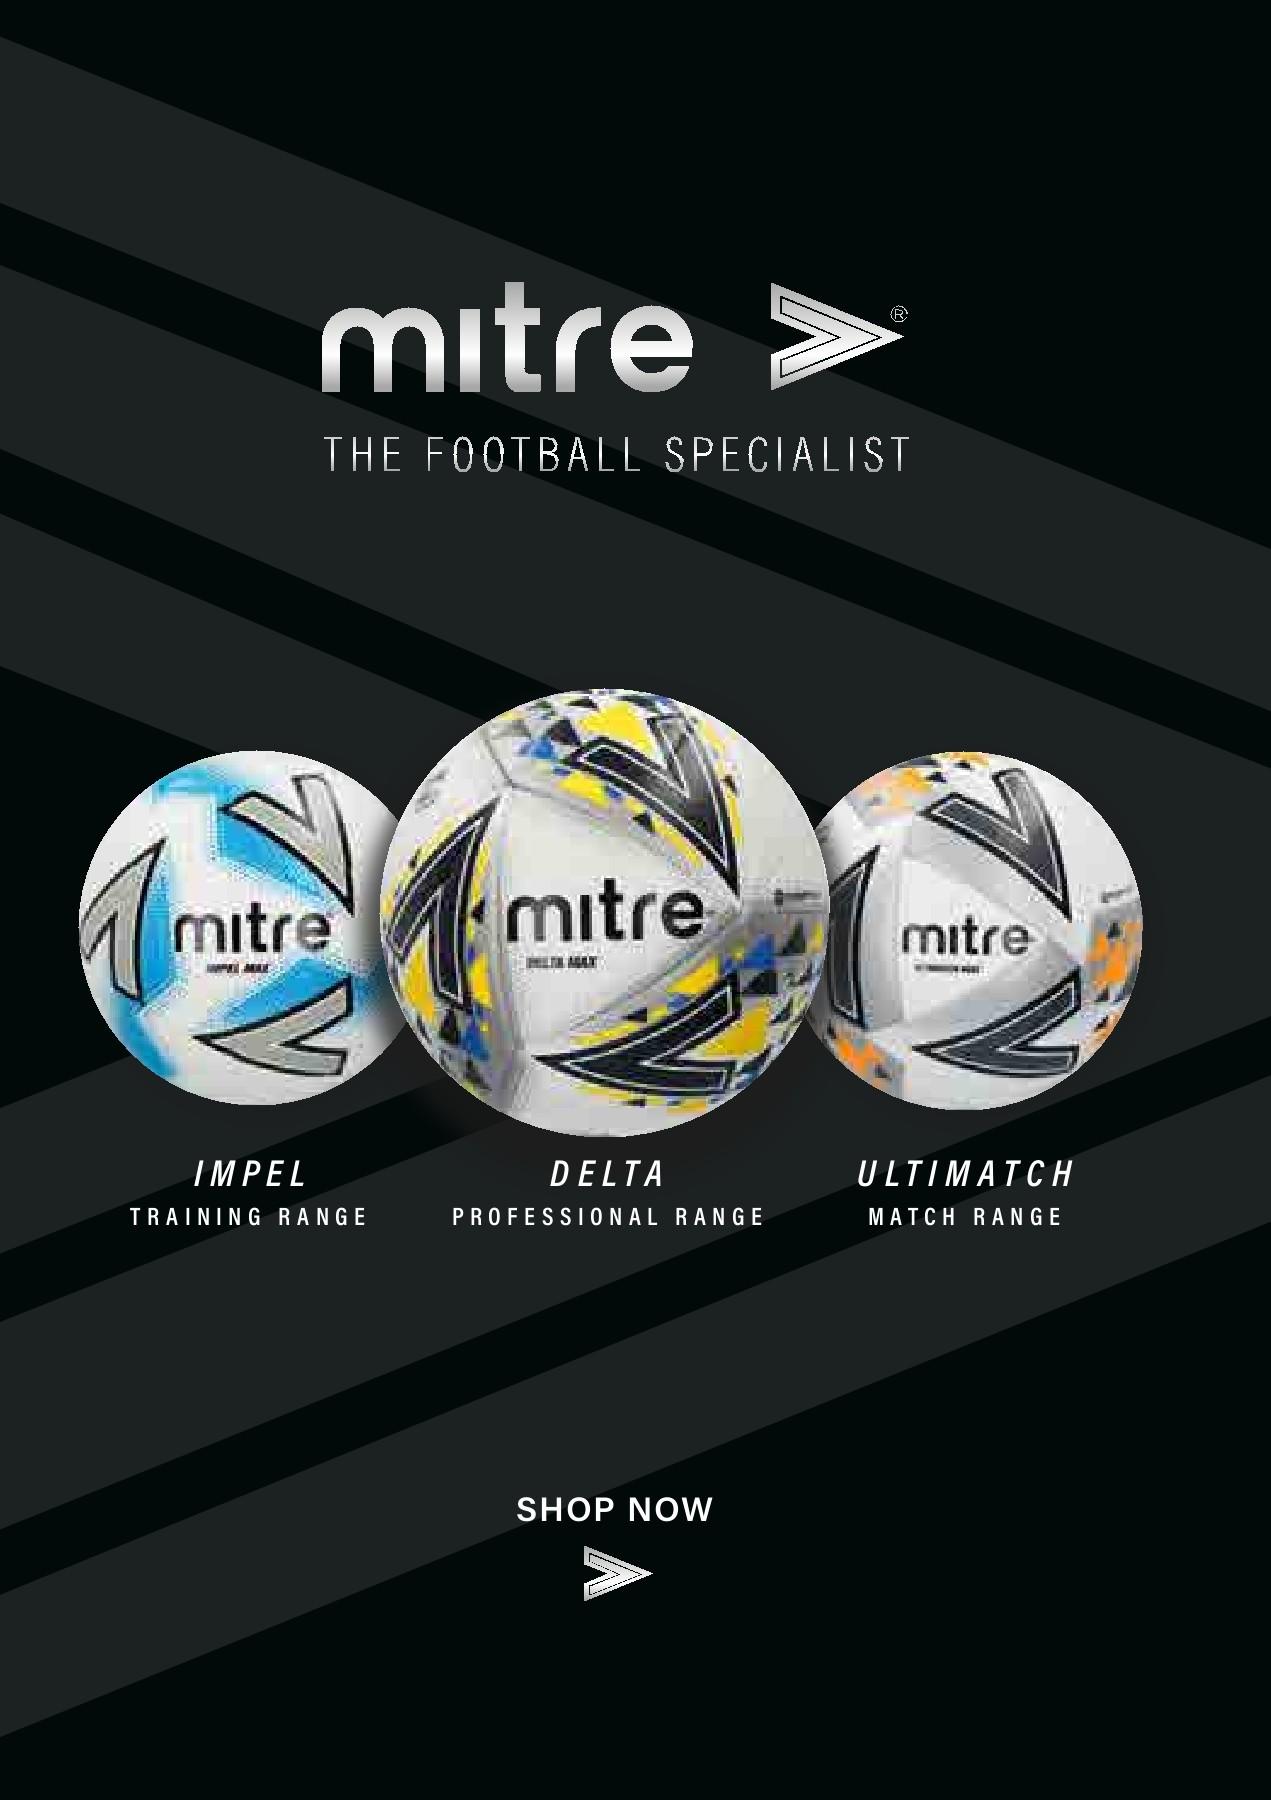 Mitre Impel MAX 10 mix White//Yellow Footballs Plus FREE Mesh Bag